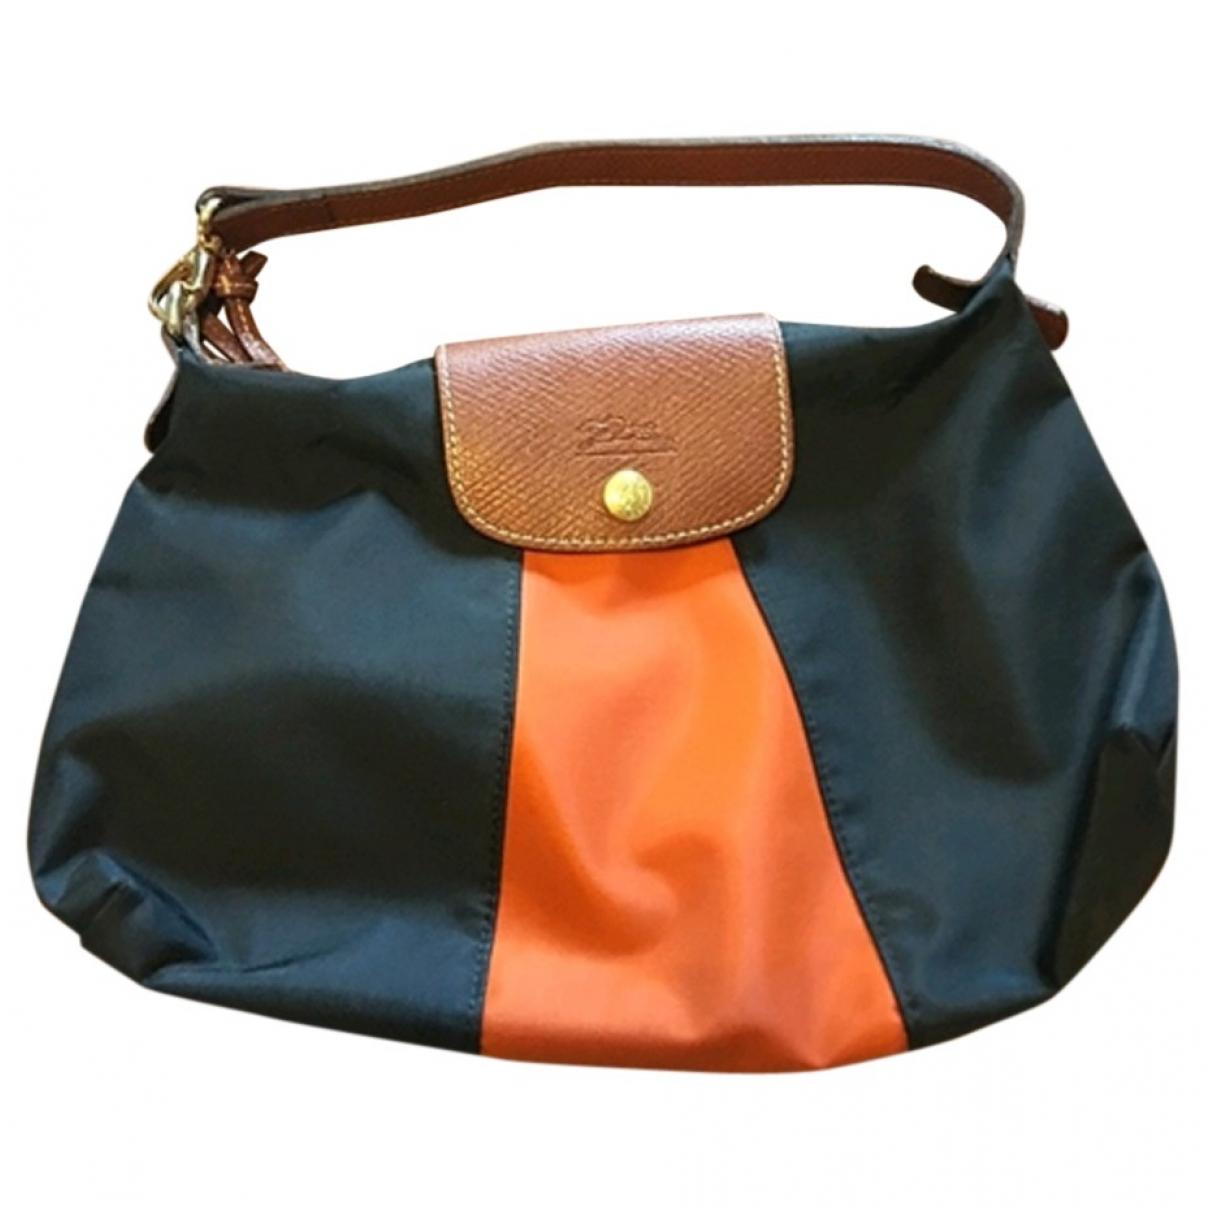 Longchamp \N Handtasche in Polyester